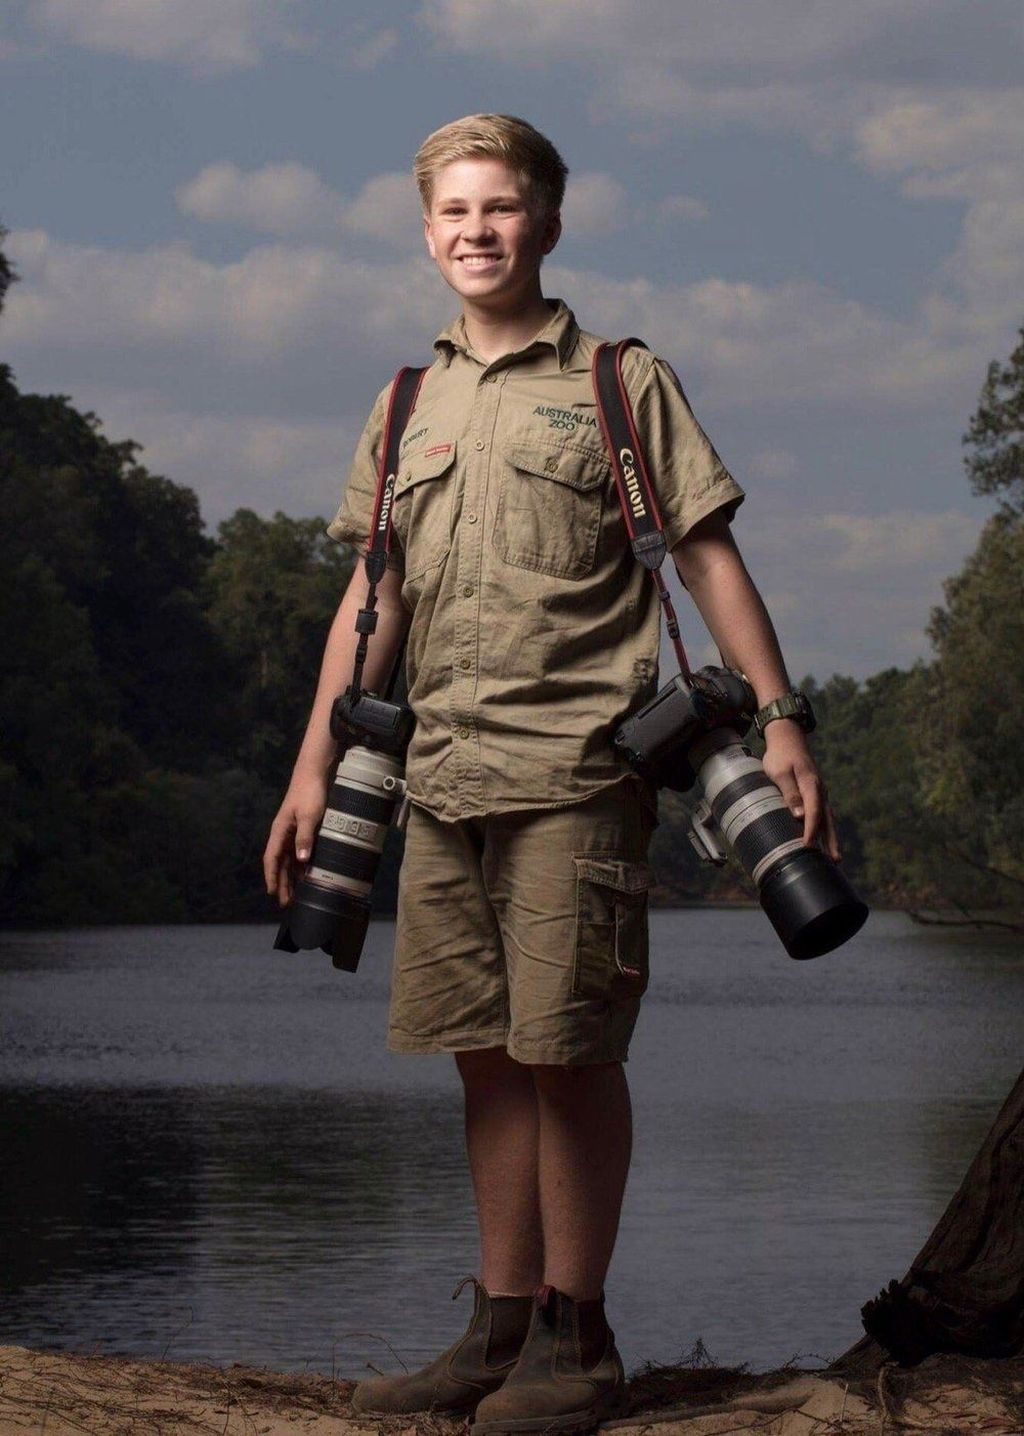 Dia adalah Robert Irwin bocah berusia 13 tahun yang merupakan anak kedua dari Steve Irwin. Seperti diketahui nama Steve Irwin merupakan sosok terkenal di dunia perhewanan buas. Ia terkenal dengan julukan Sang Penakluk Buaya.Foto: Robert Irwin